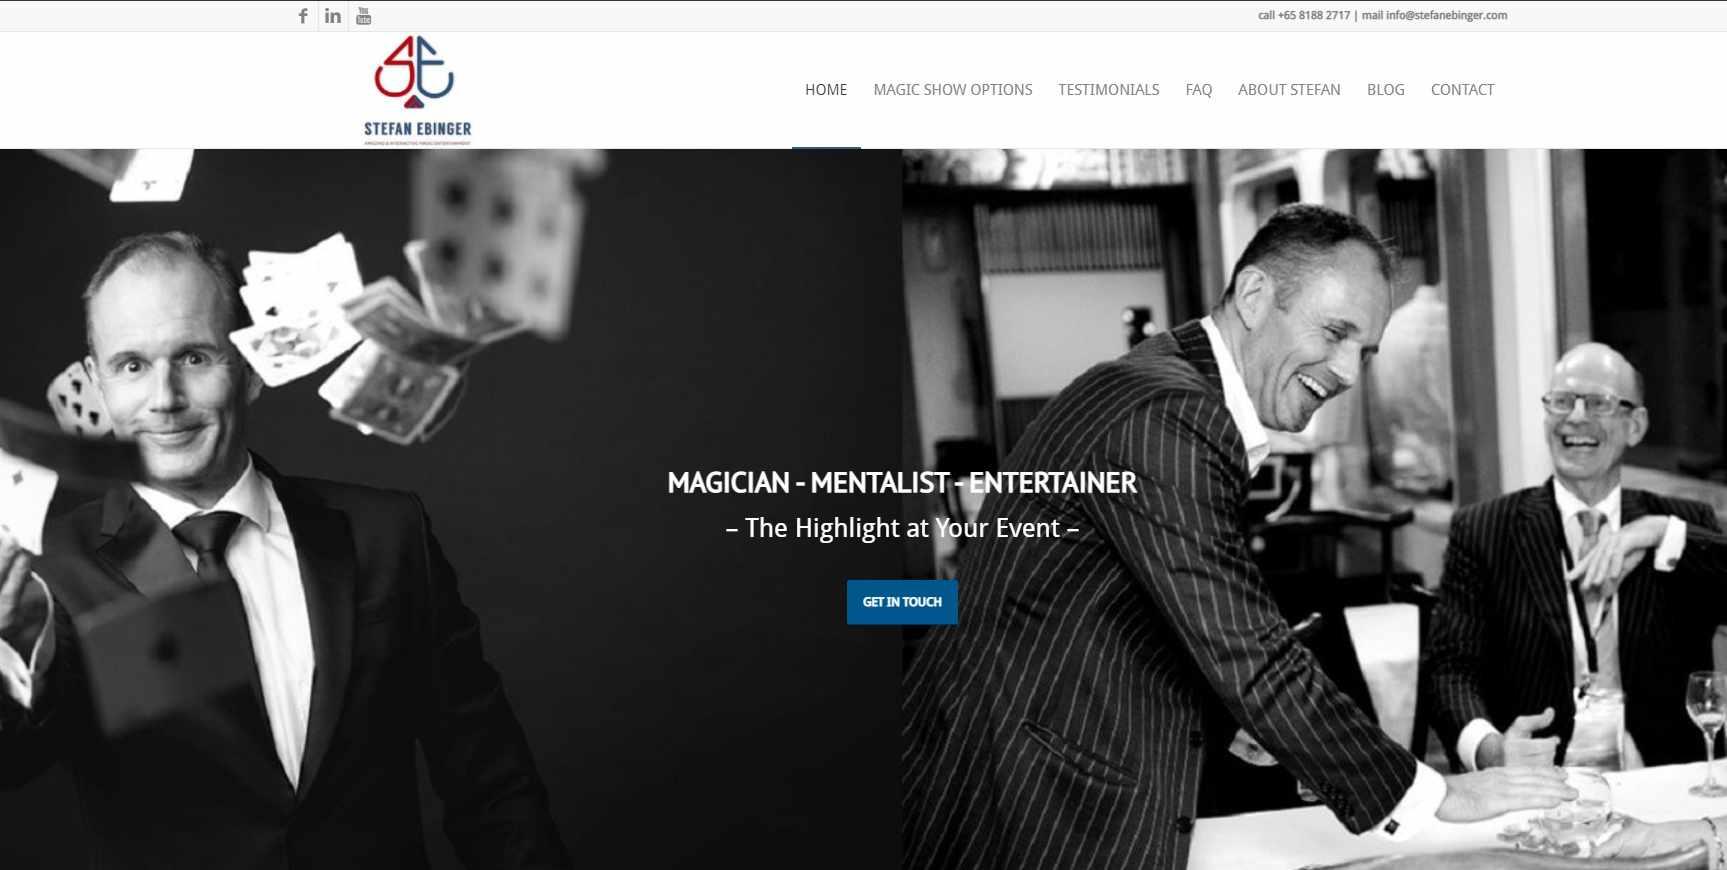 stefan ebinger Top Magicians in Singapore